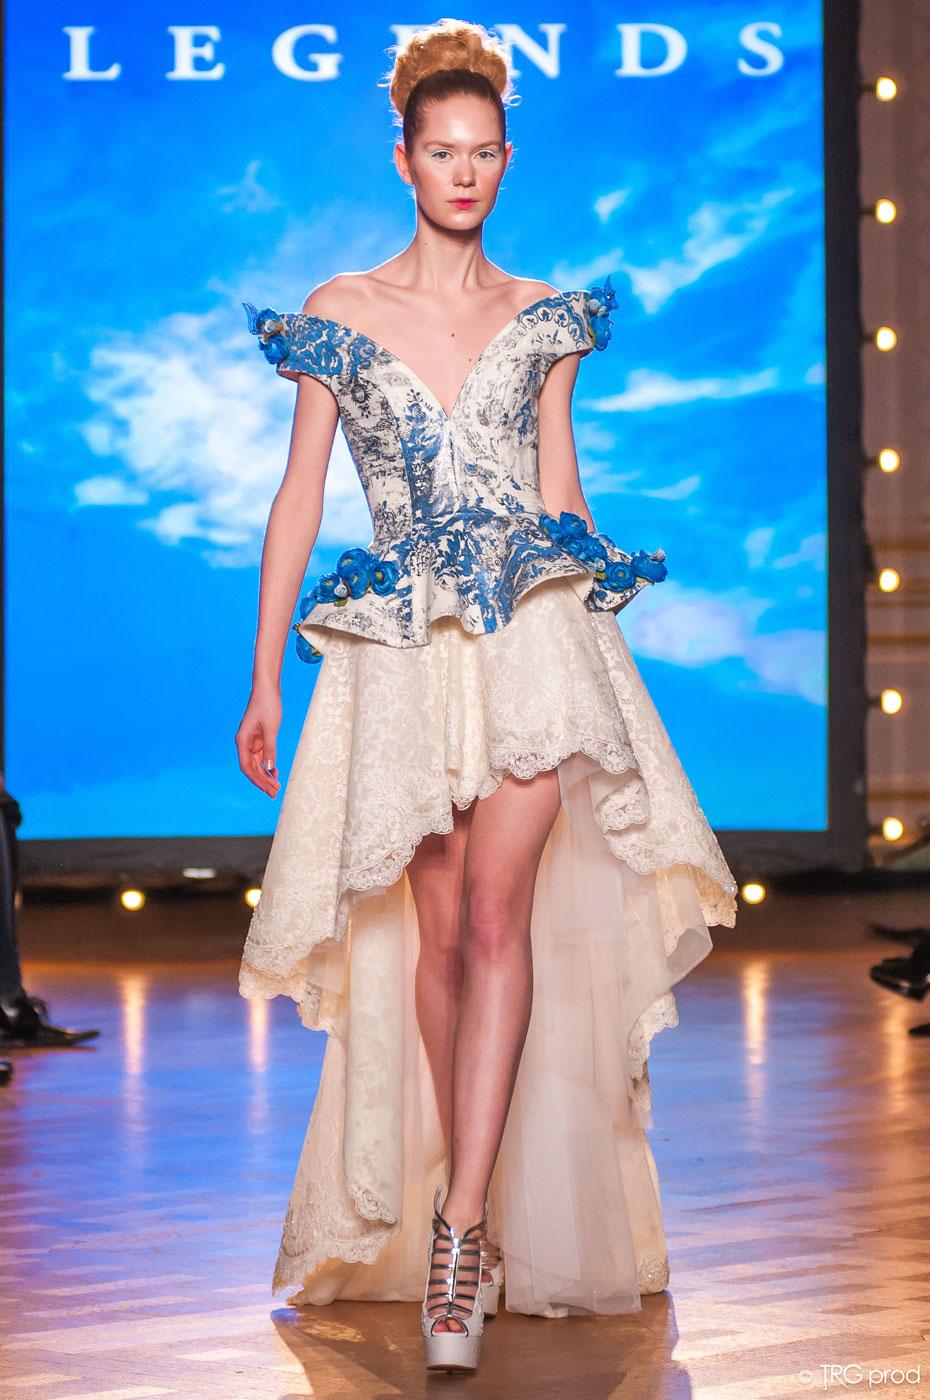 Legends-fashion-runway-show-haute-couture-paris-spring-2015-the-impression-04